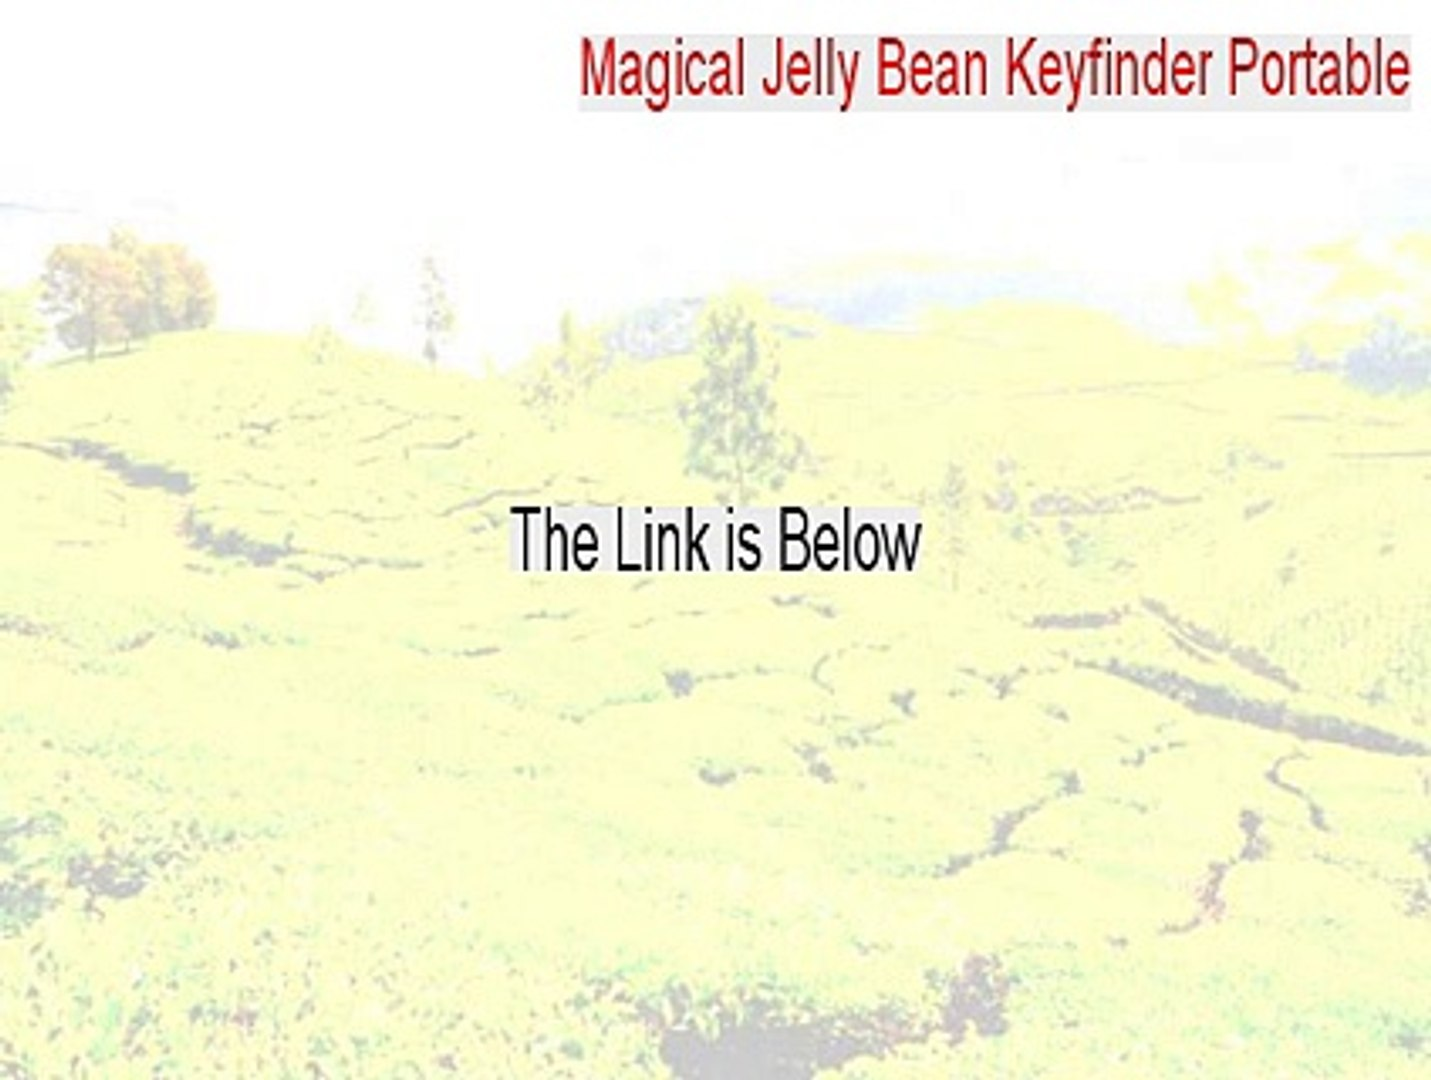 crack magical jelly bean keyfinder